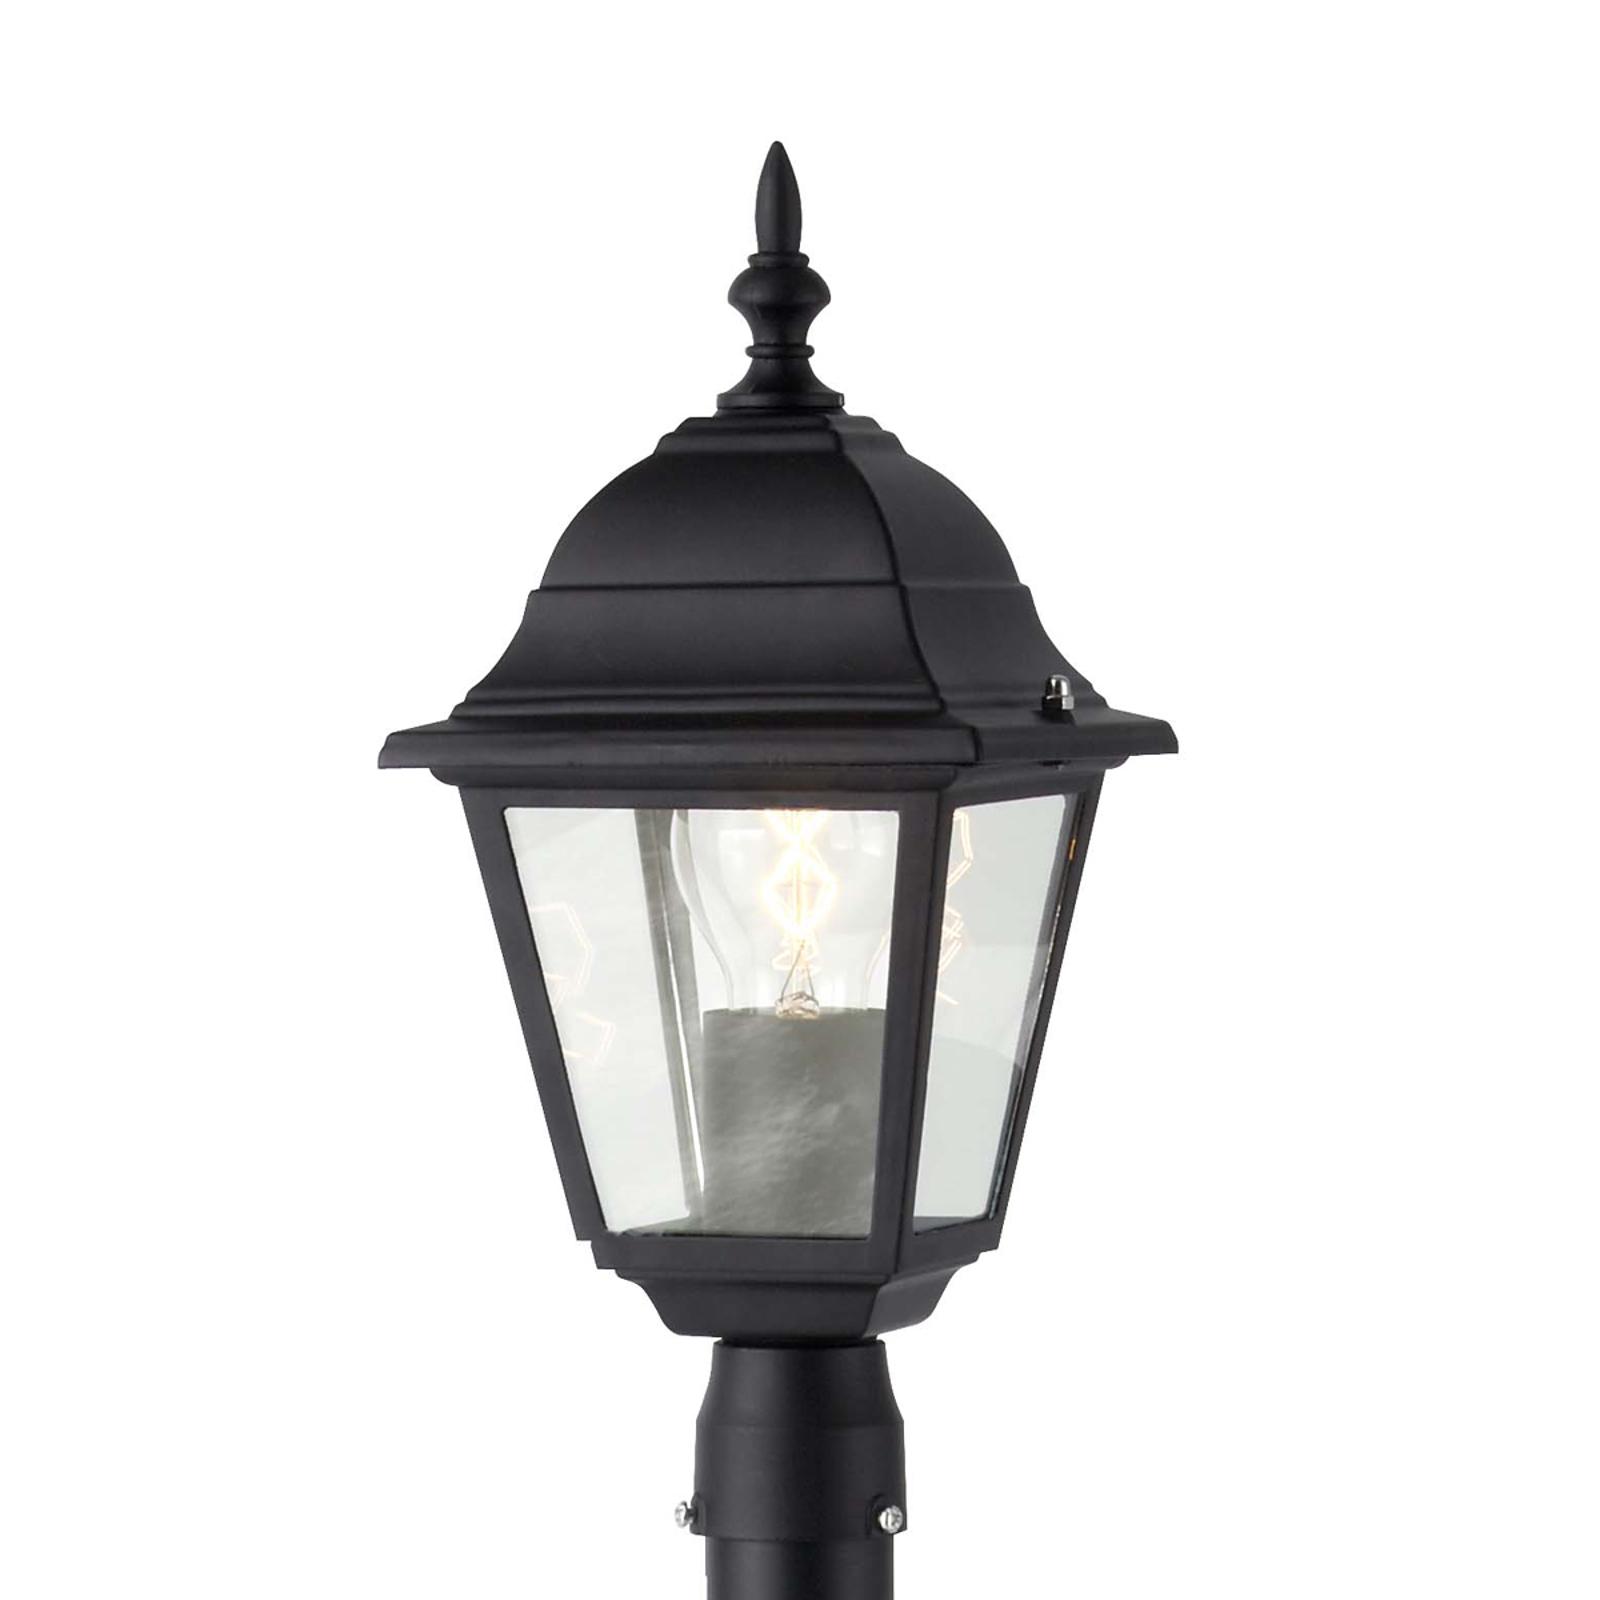 Padverlichting Newport